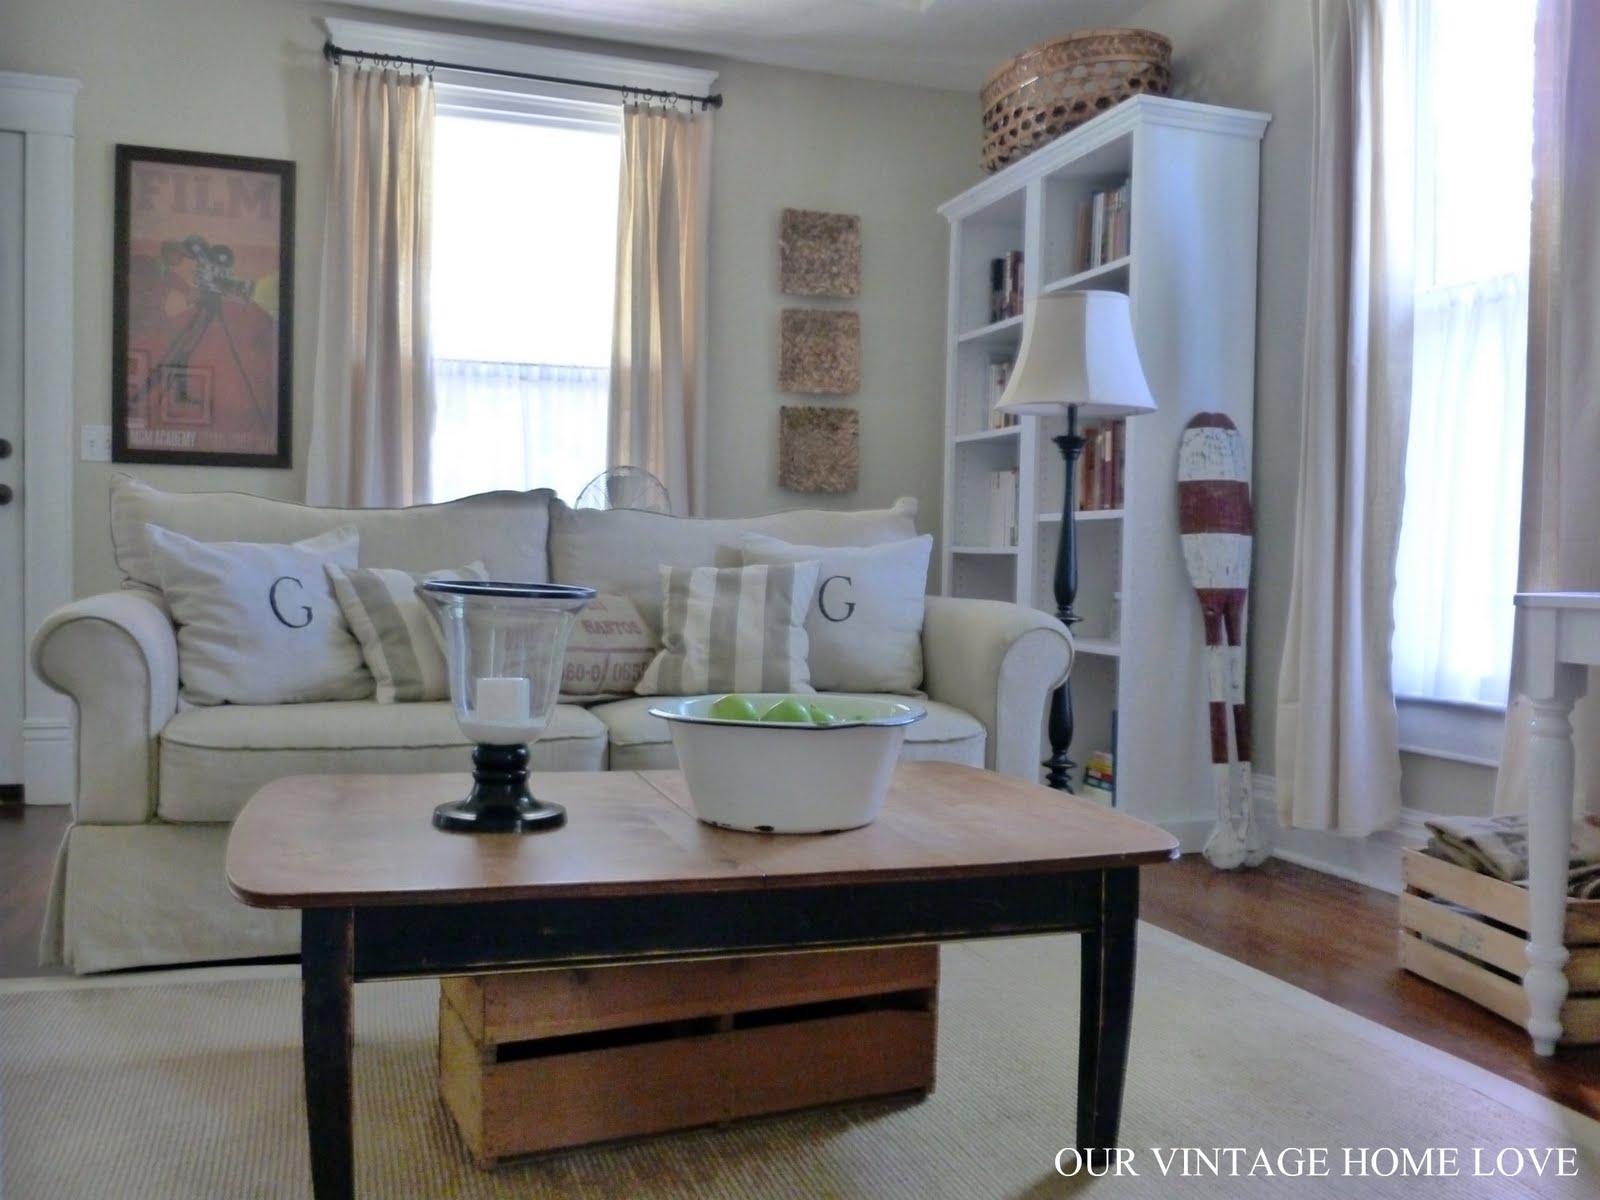 lovely living room desk | vintage home love: Living Room Ideas and a New Desk